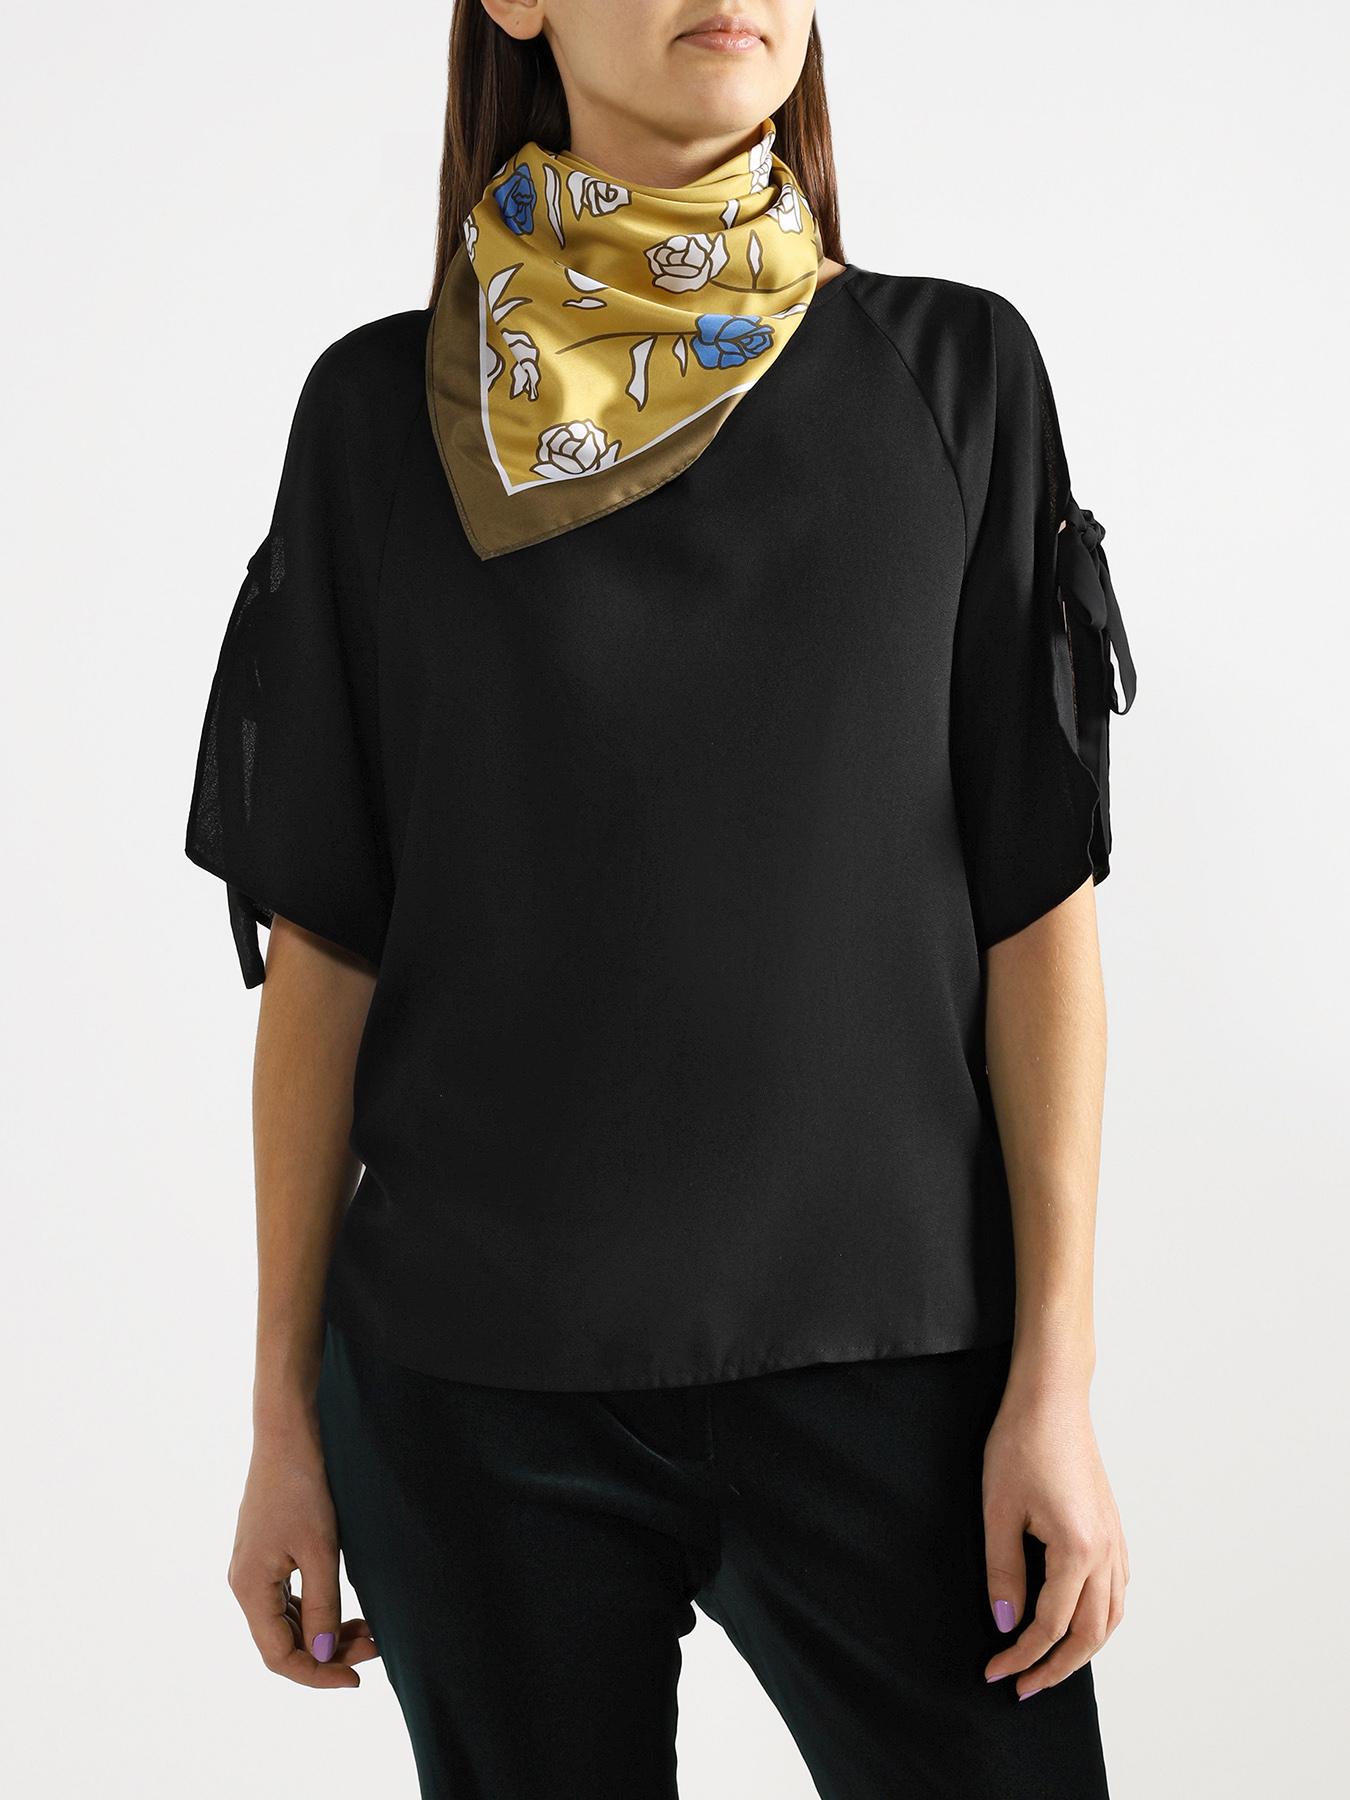 karen mabon платок Платок Alessandro Manzoni Женский платок